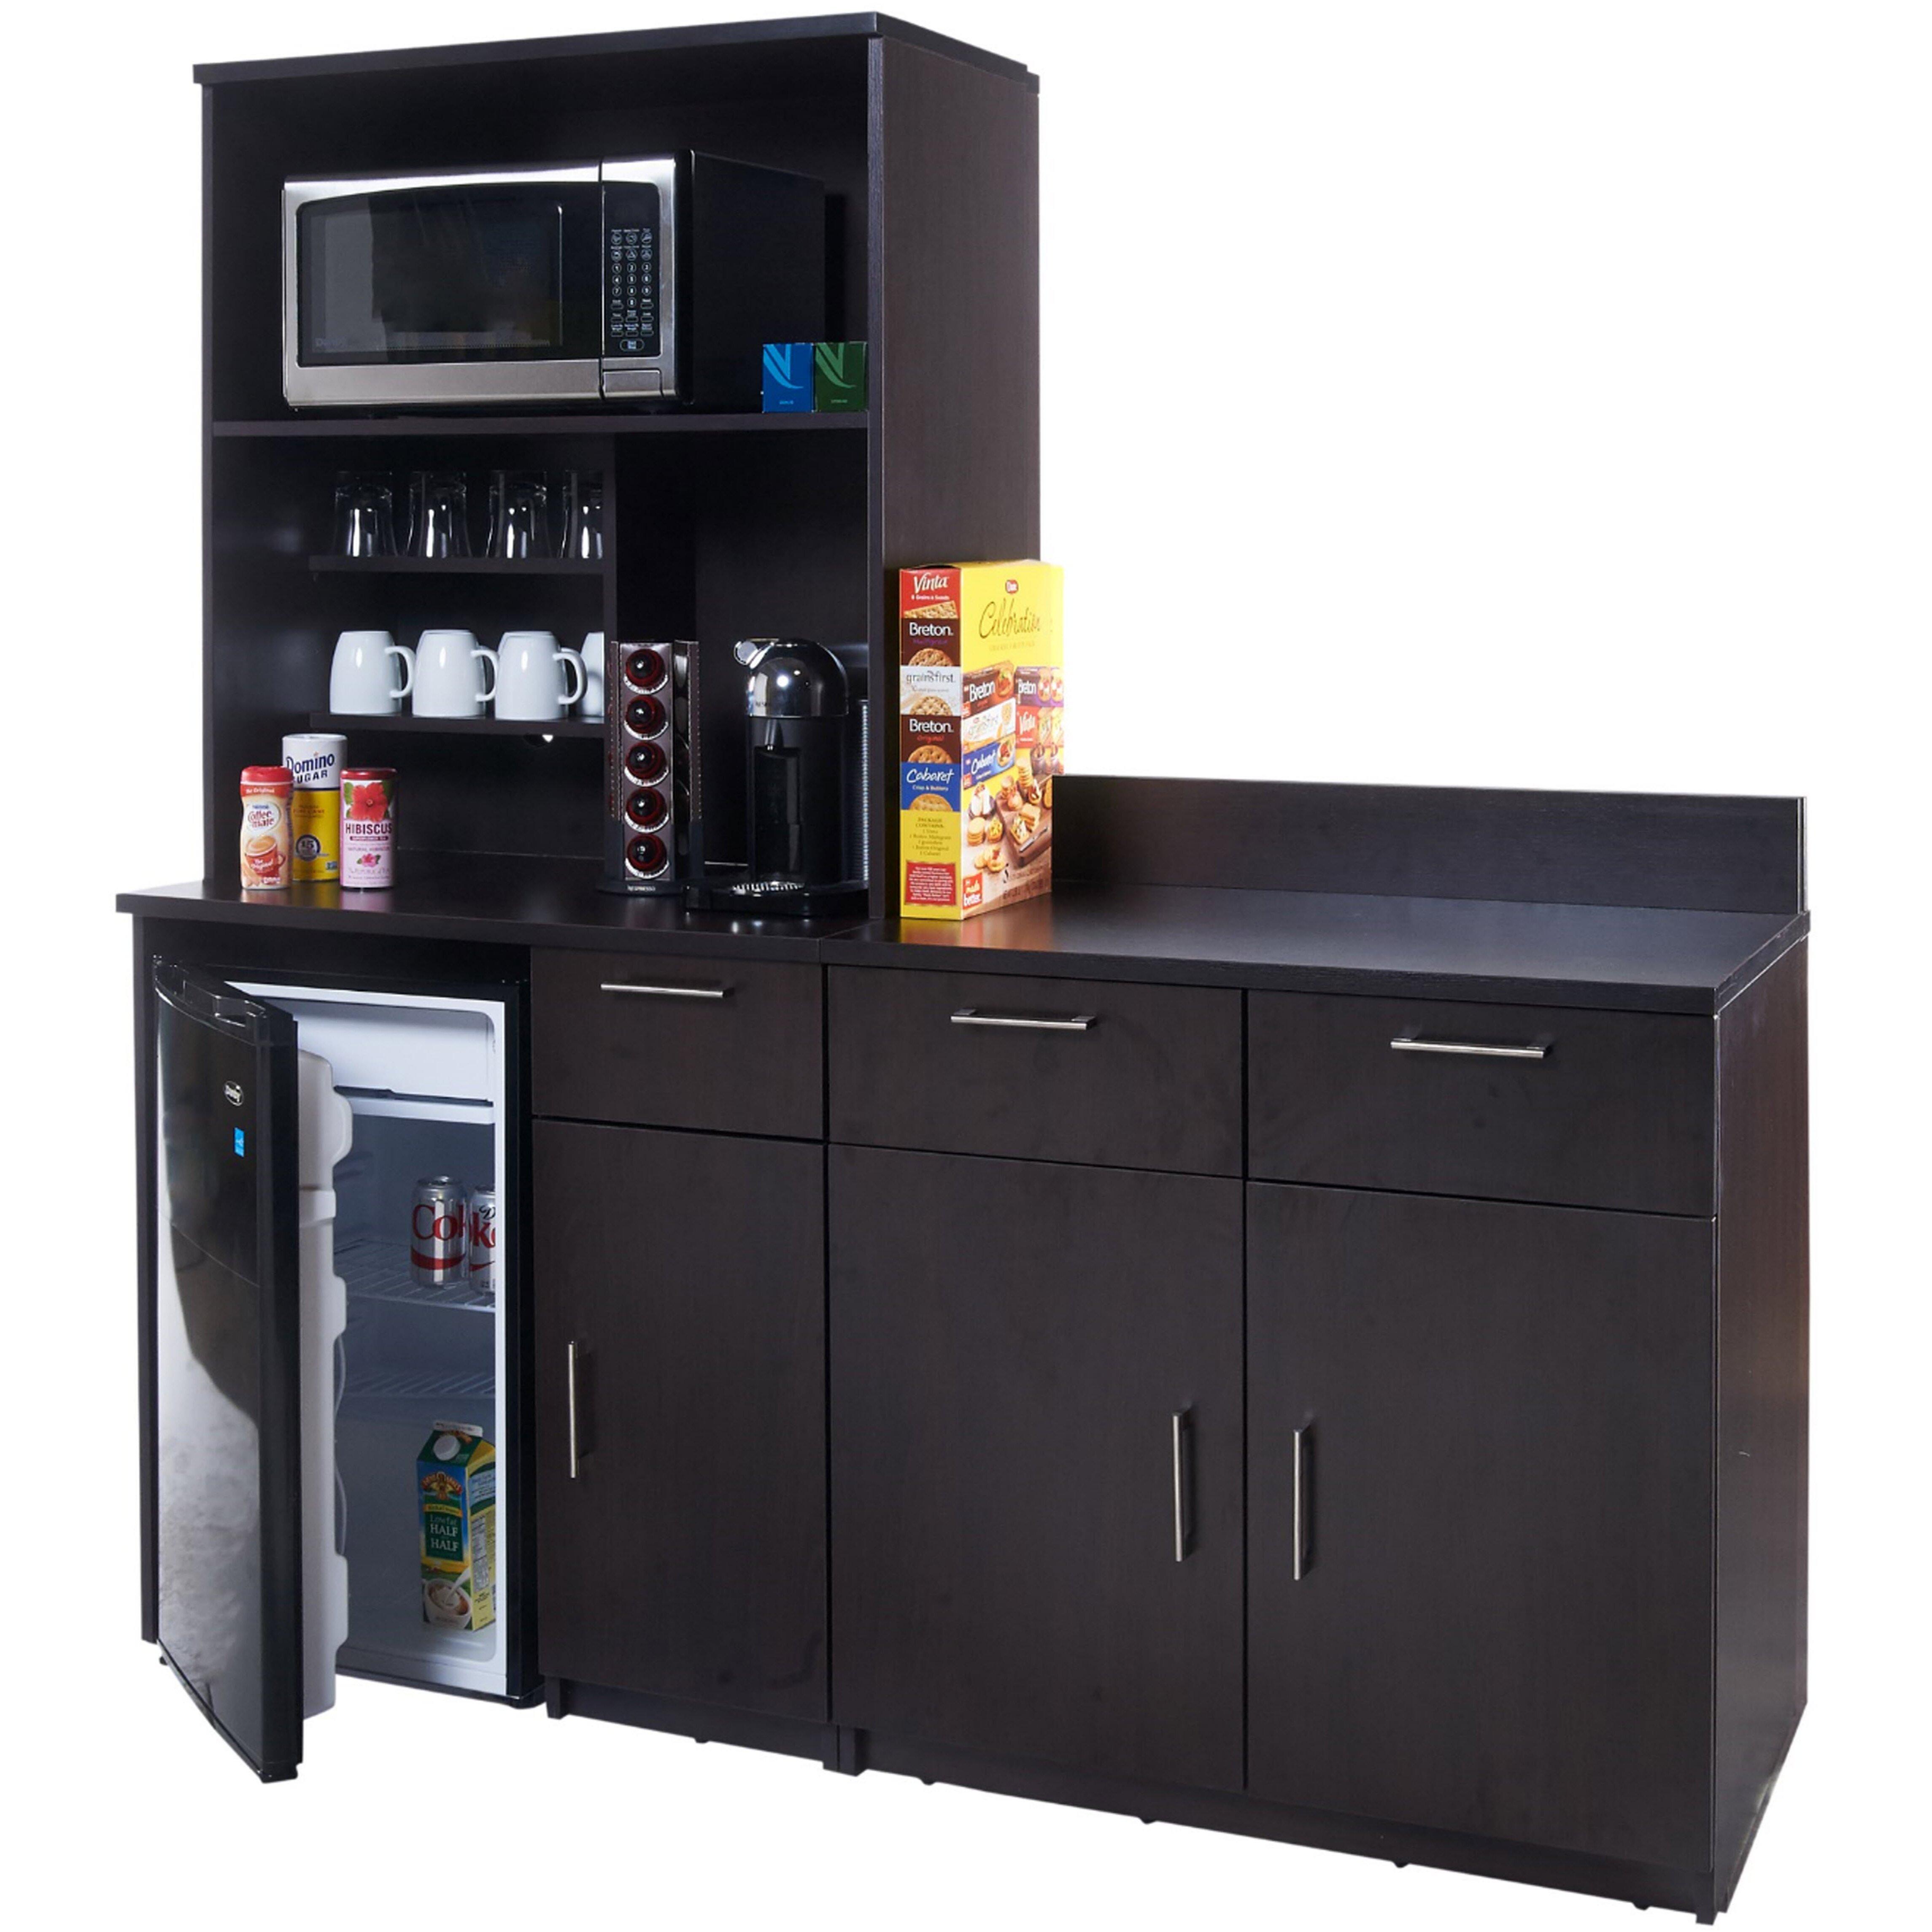 Breaktime 75 kitchen pantry cabinet wayfair for Wayfair kitchen cabinets